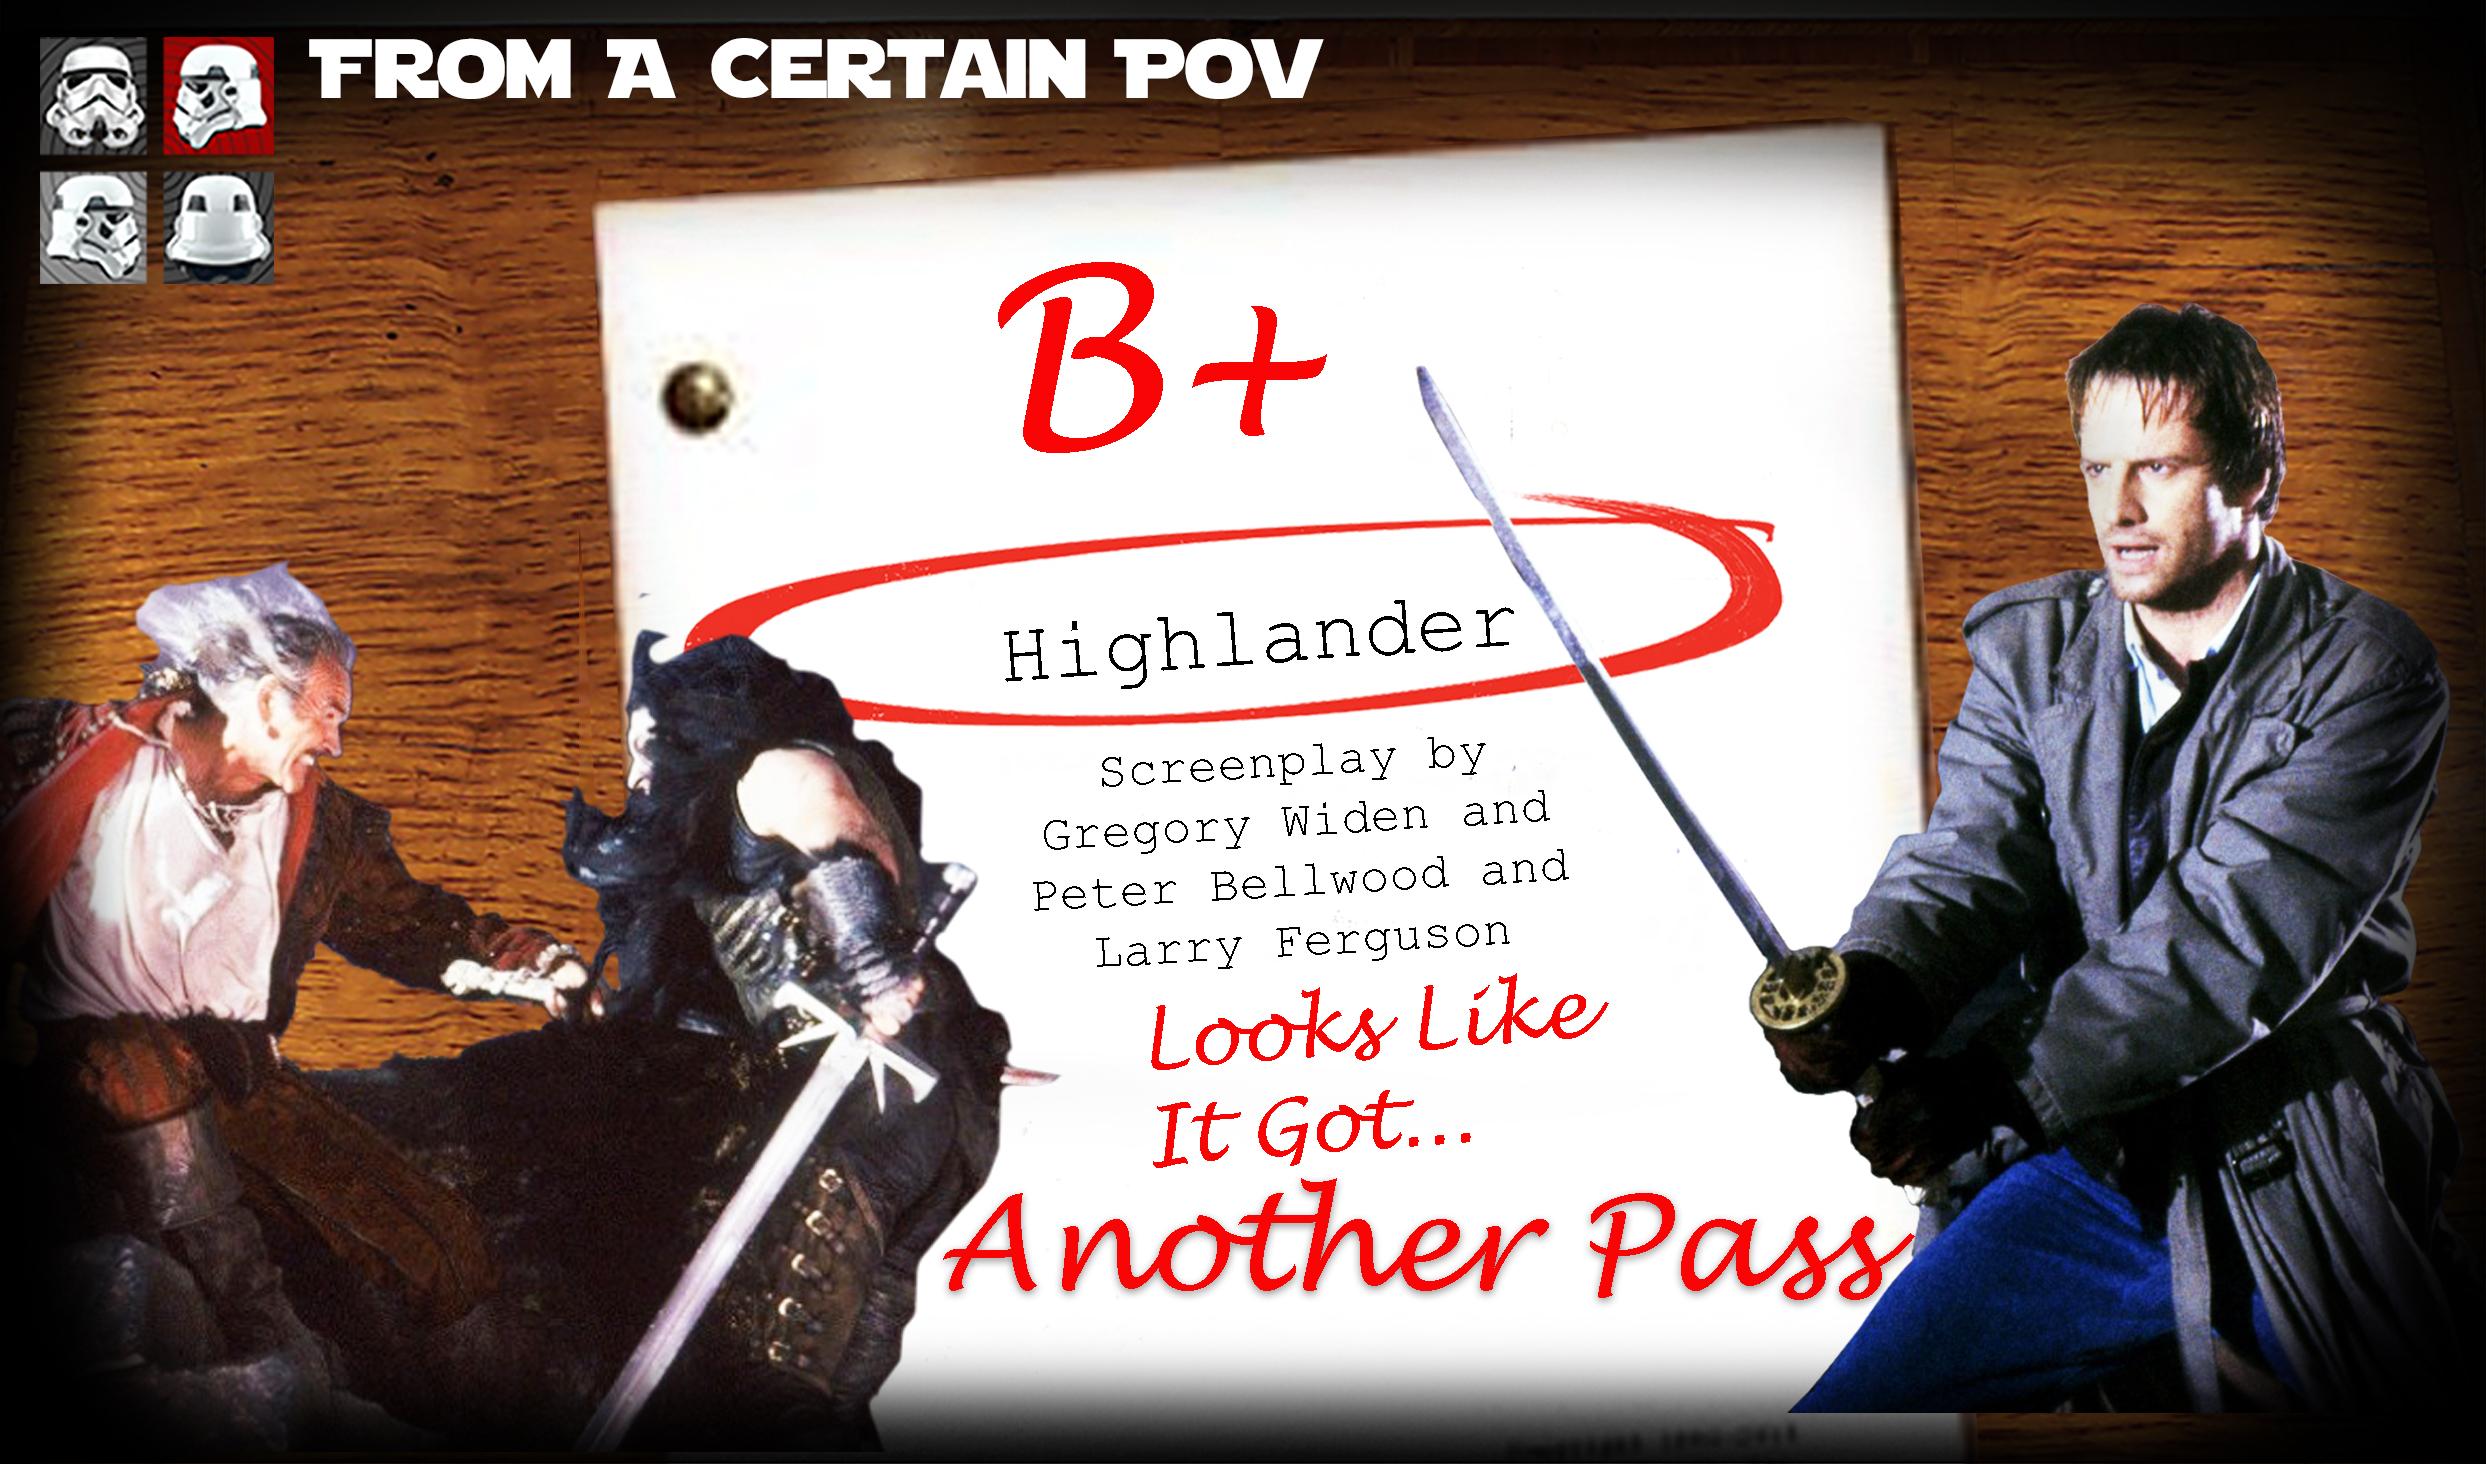 50 - Another Pass at Highlander Banner.jpg